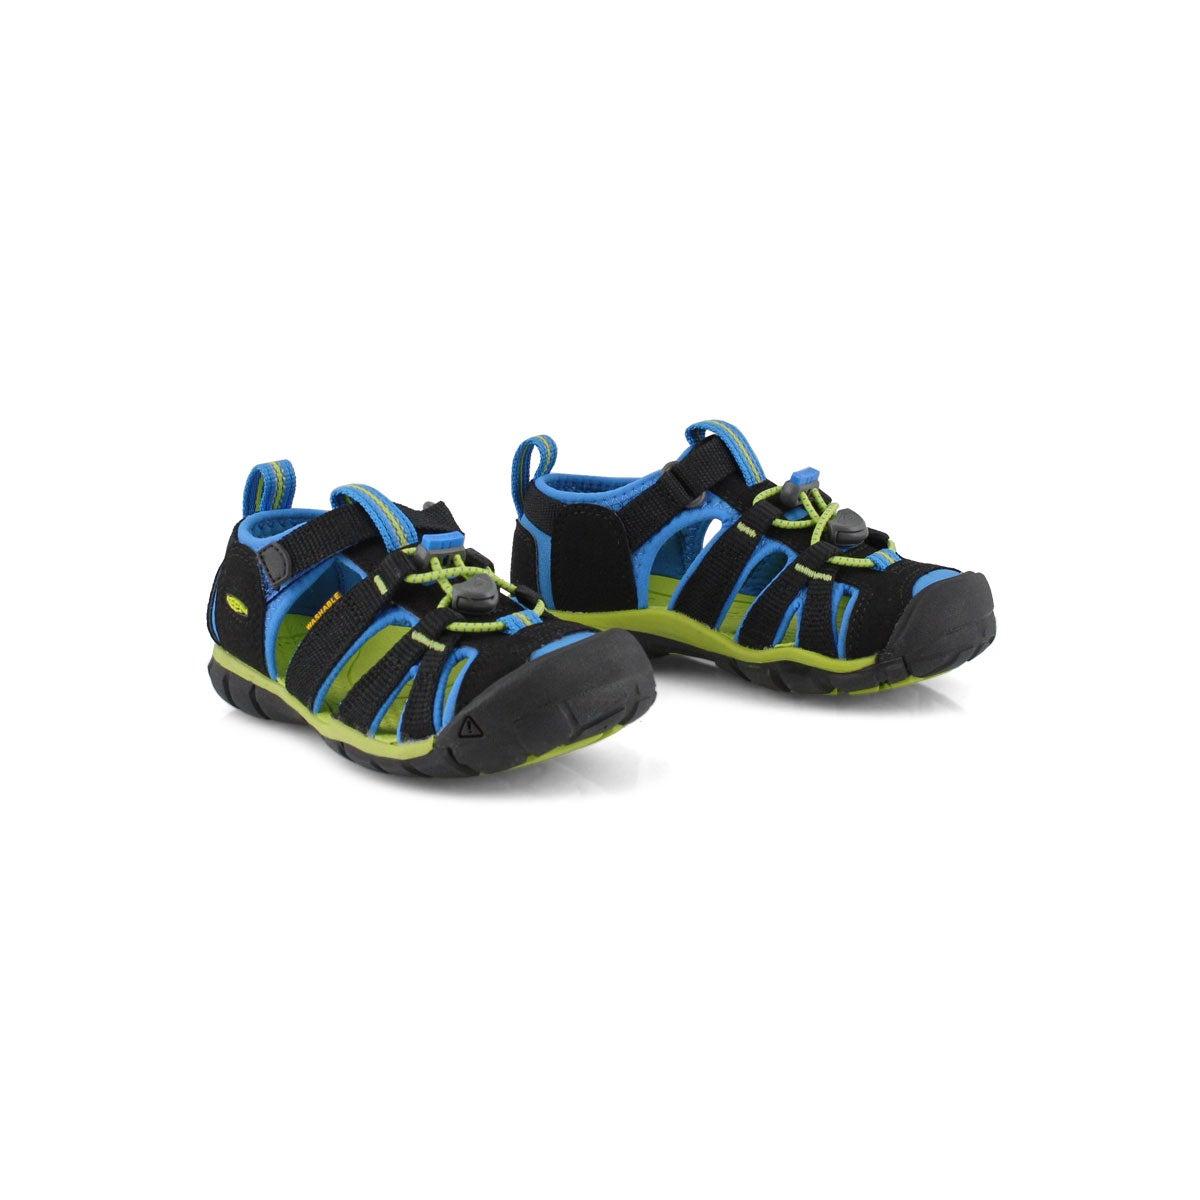 Infant's Seacamp II CNX Sport Sandal - Black/Blue